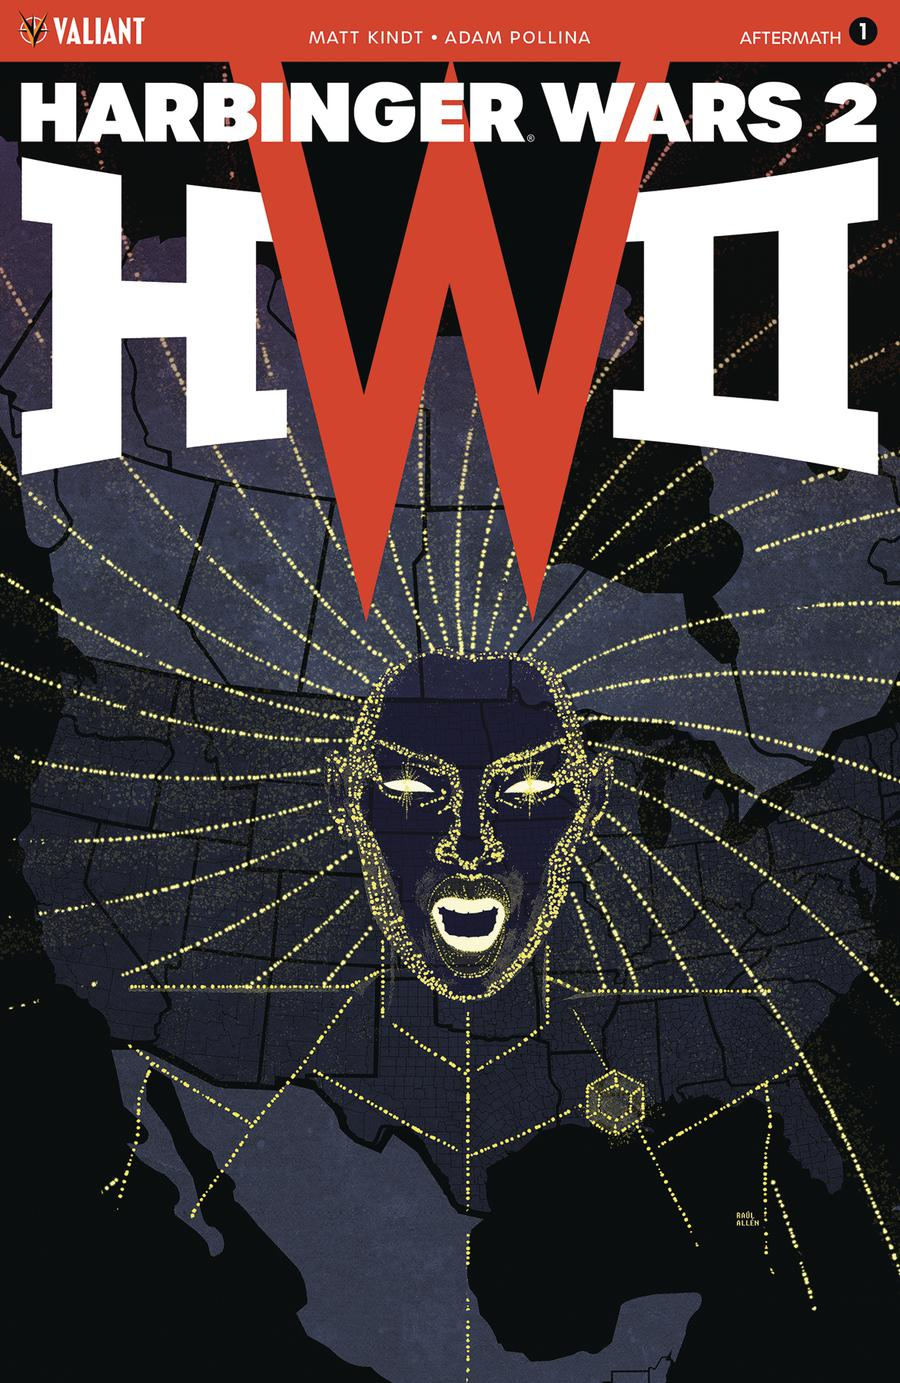 Harbinger Wars 2 Aftermath #1 Cover A Regular Raul Allen Cover